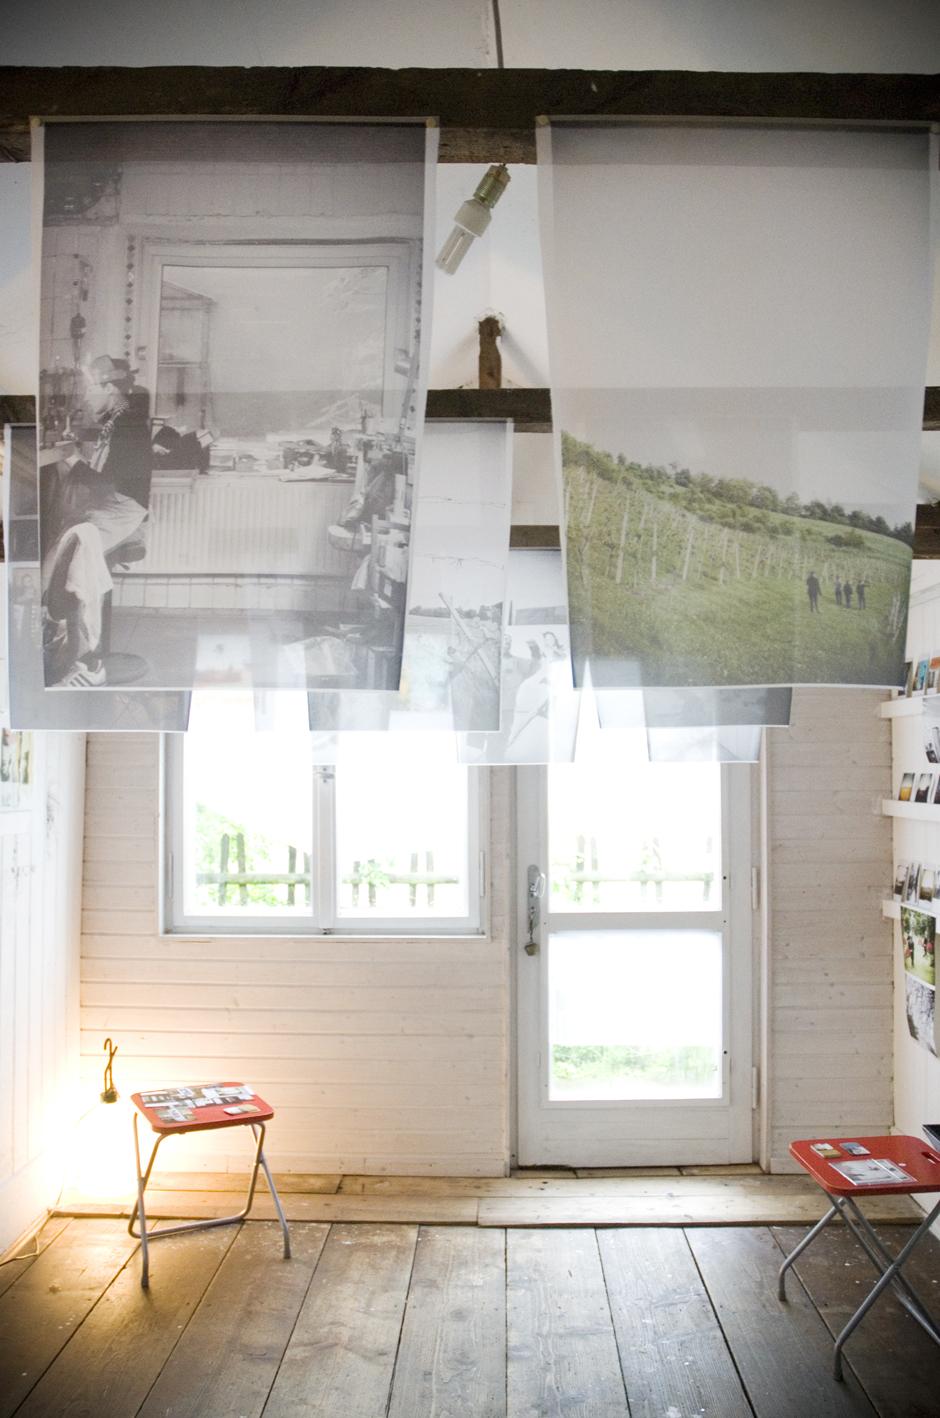 Artists Working.  Atelier-drei , Munich, Germany. 2010.